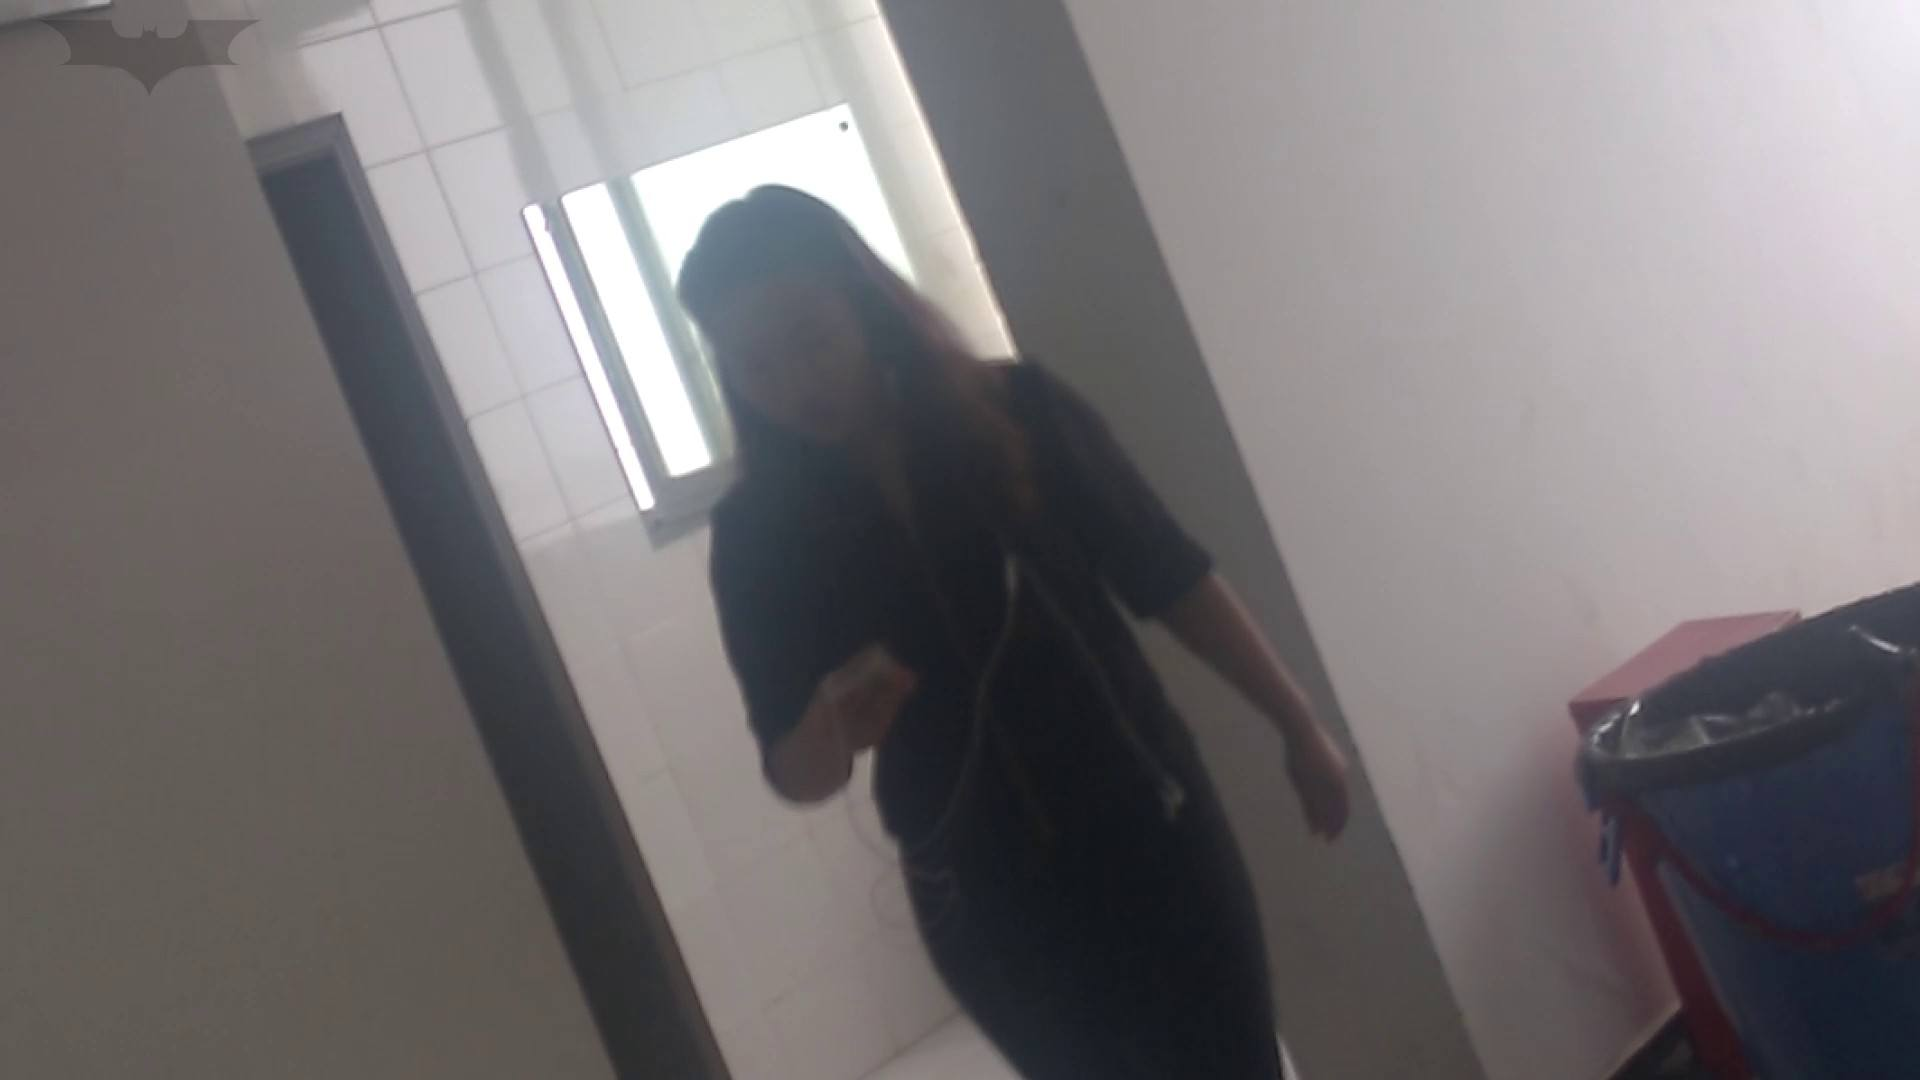 JD盗撮 美女の洗面所の秘密 Vol.07 細身女性 オメコ無修正動画無料 102画像 41